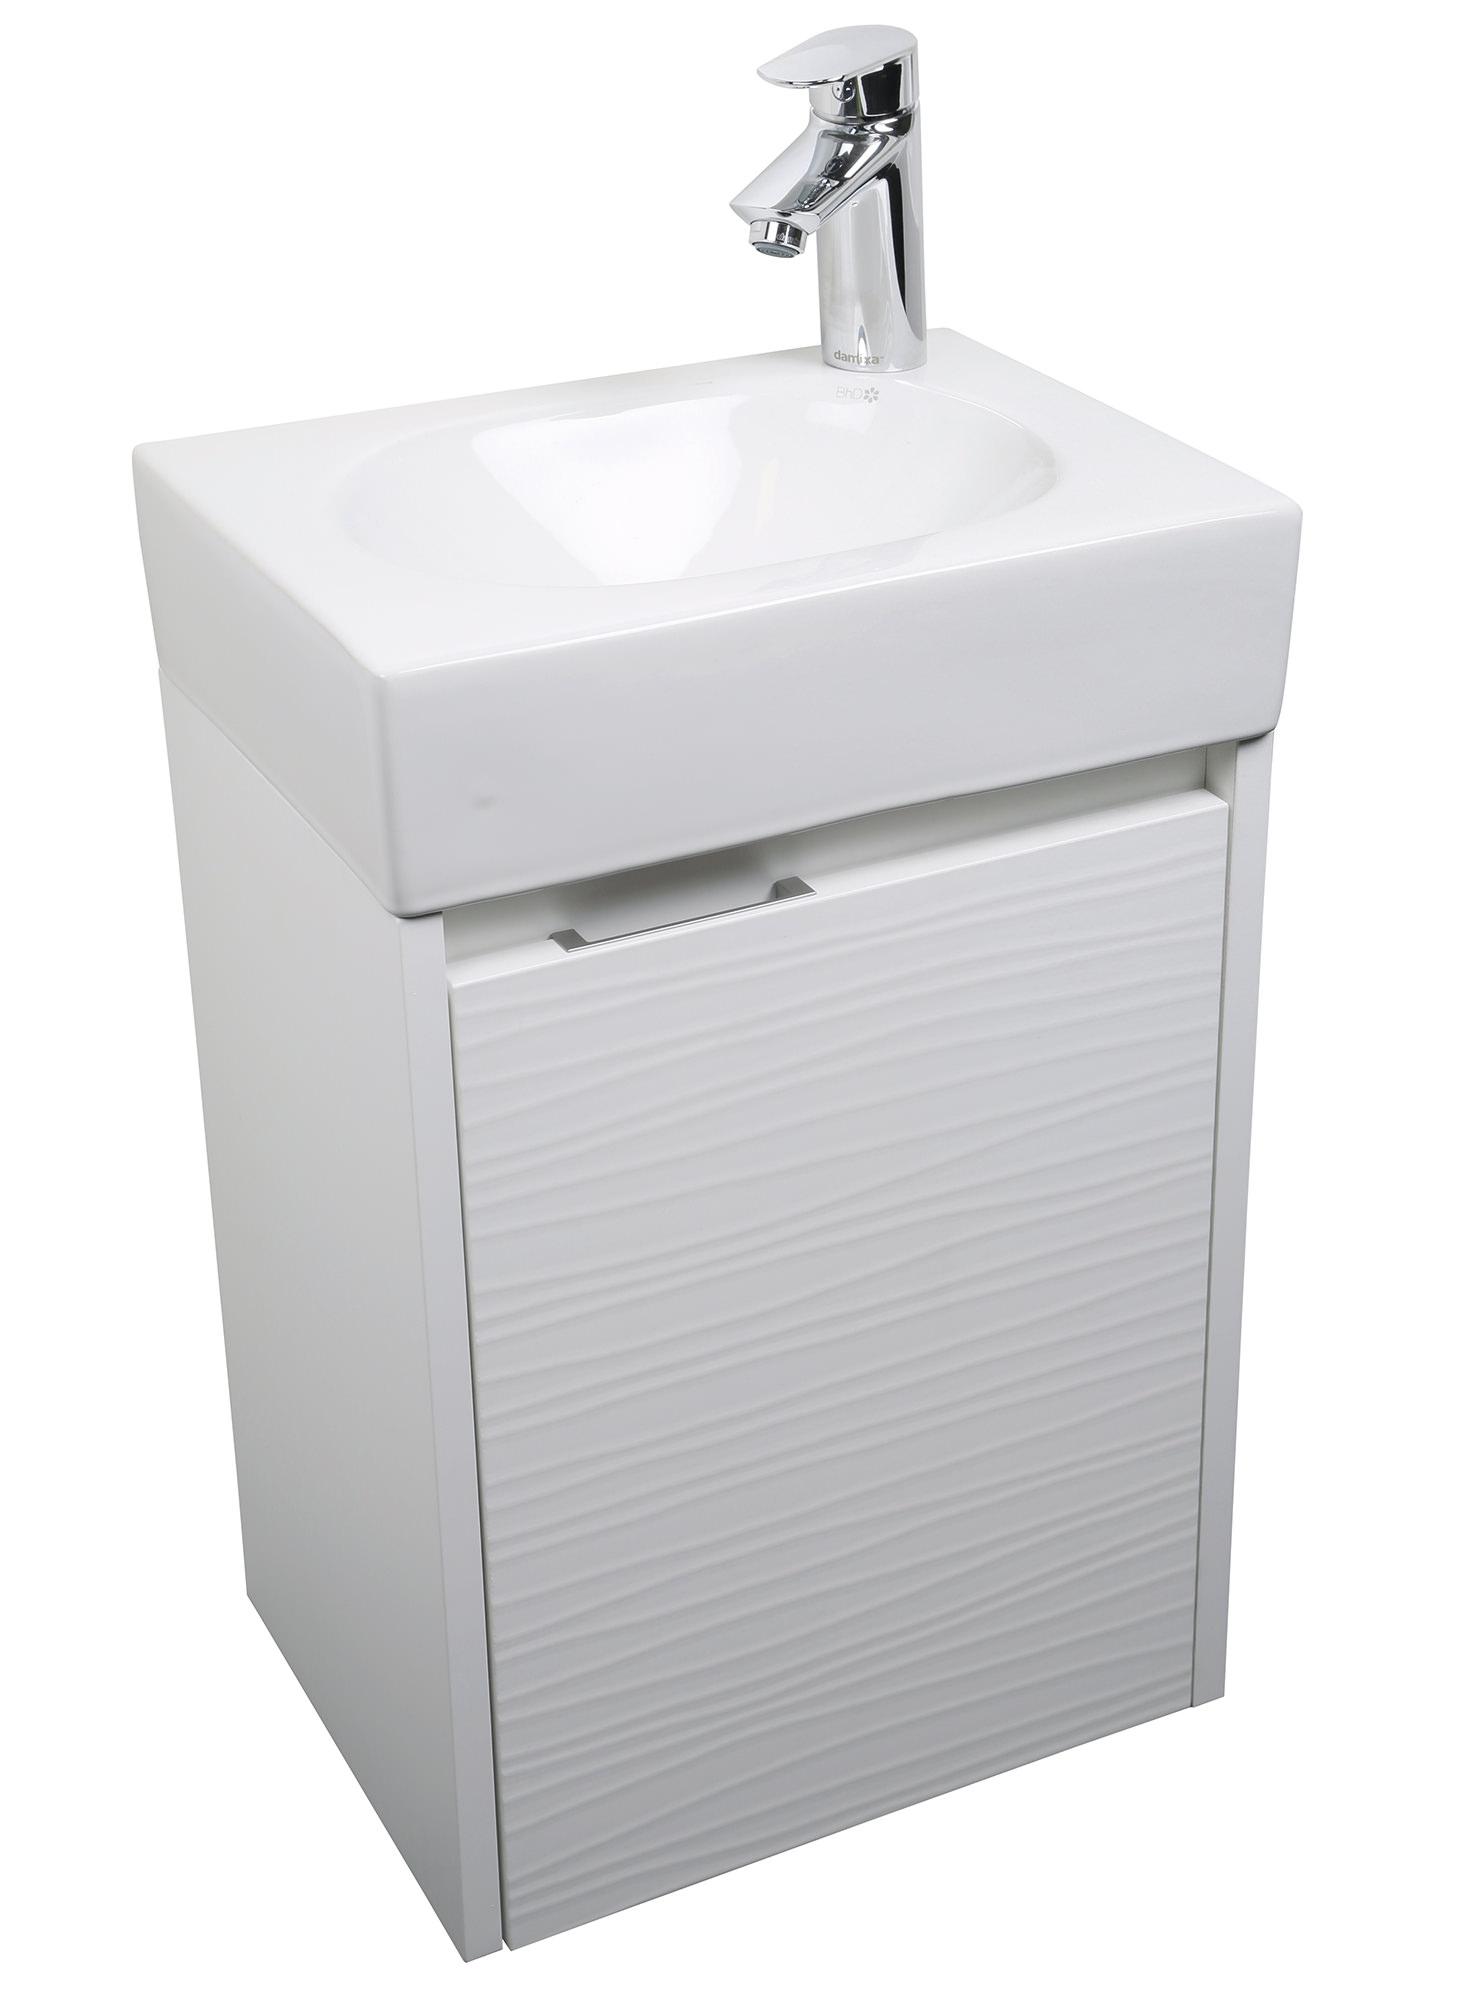 Croydex Beaulieu White Vanity Unit And Mirror Set Wc410122e